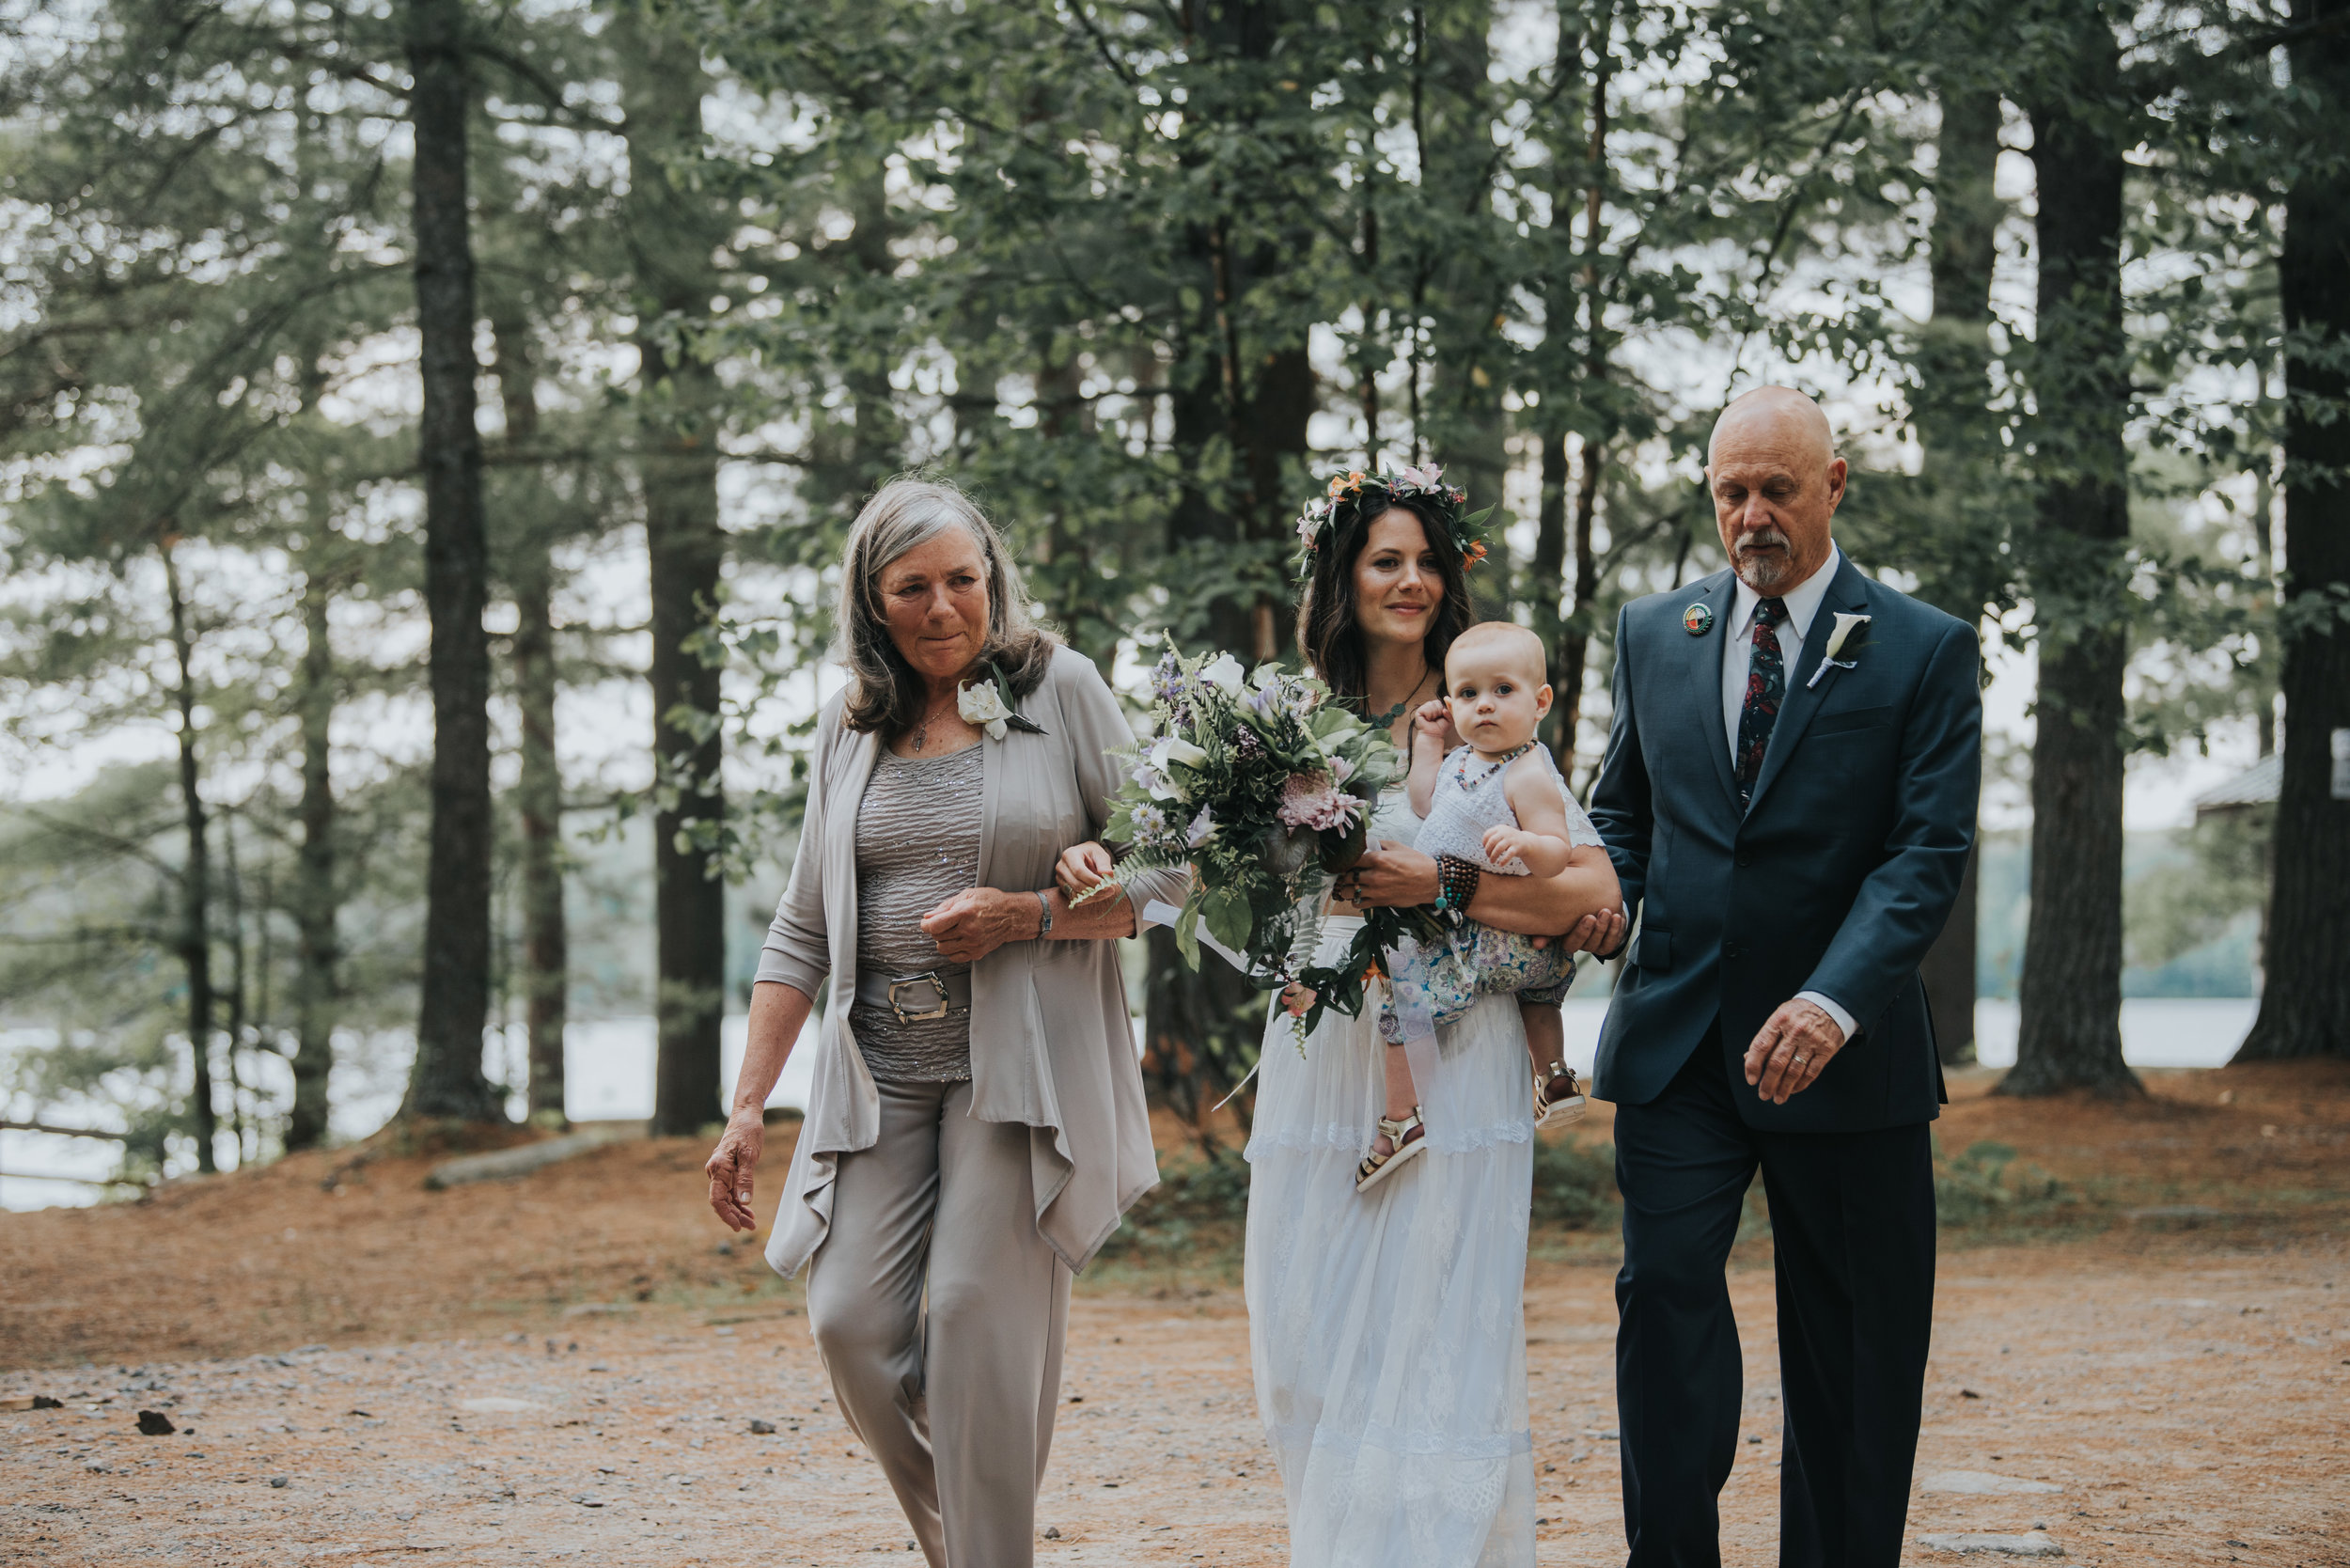 bride-waking-down-aisle-toronto-bohemian-boho-outdoor-summer-wedding-documentary-wedding-photography-by-willow-birch-photo.jpg